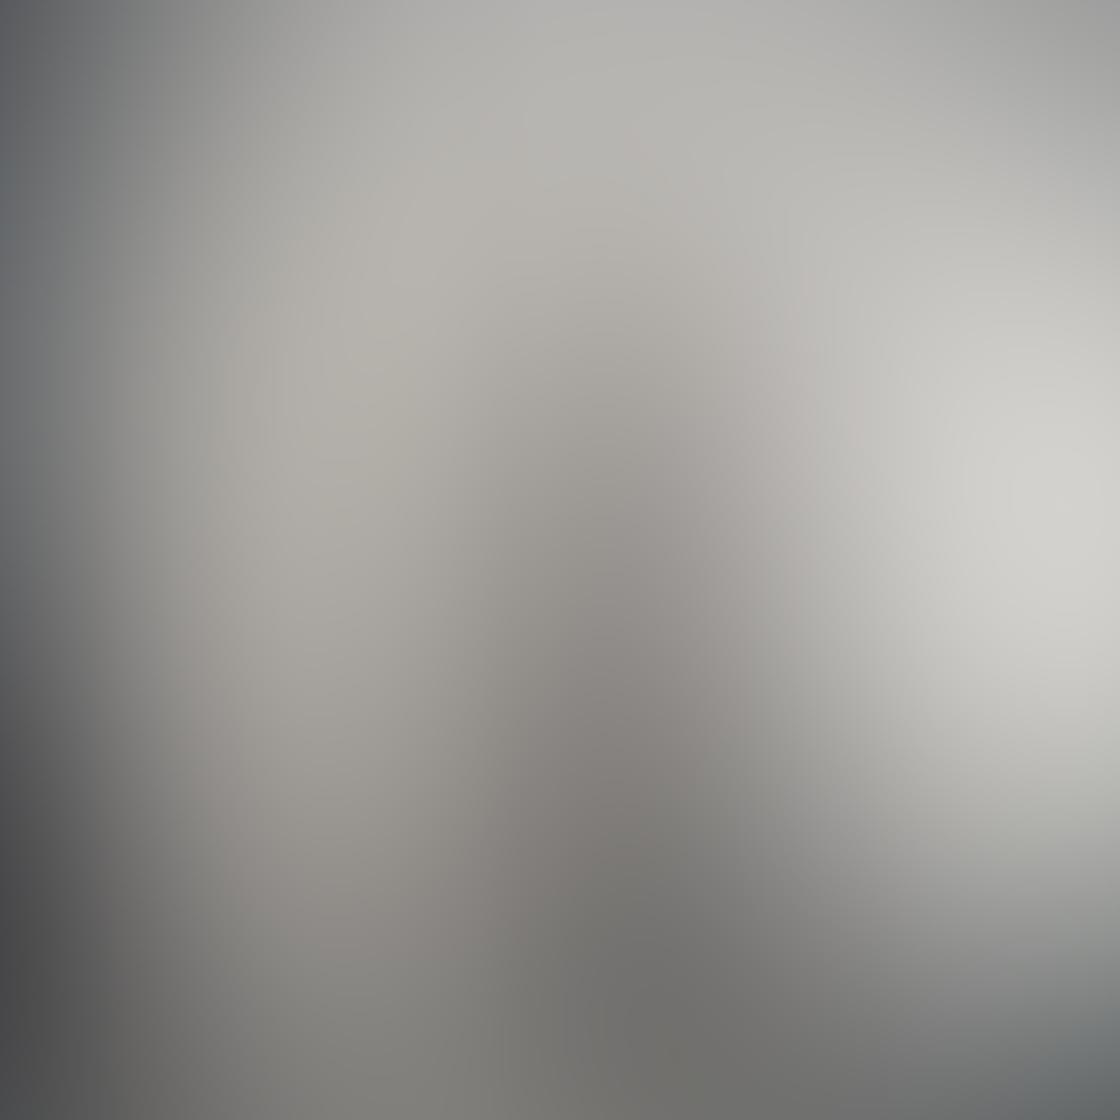 iPhone Silhouette Photos 30